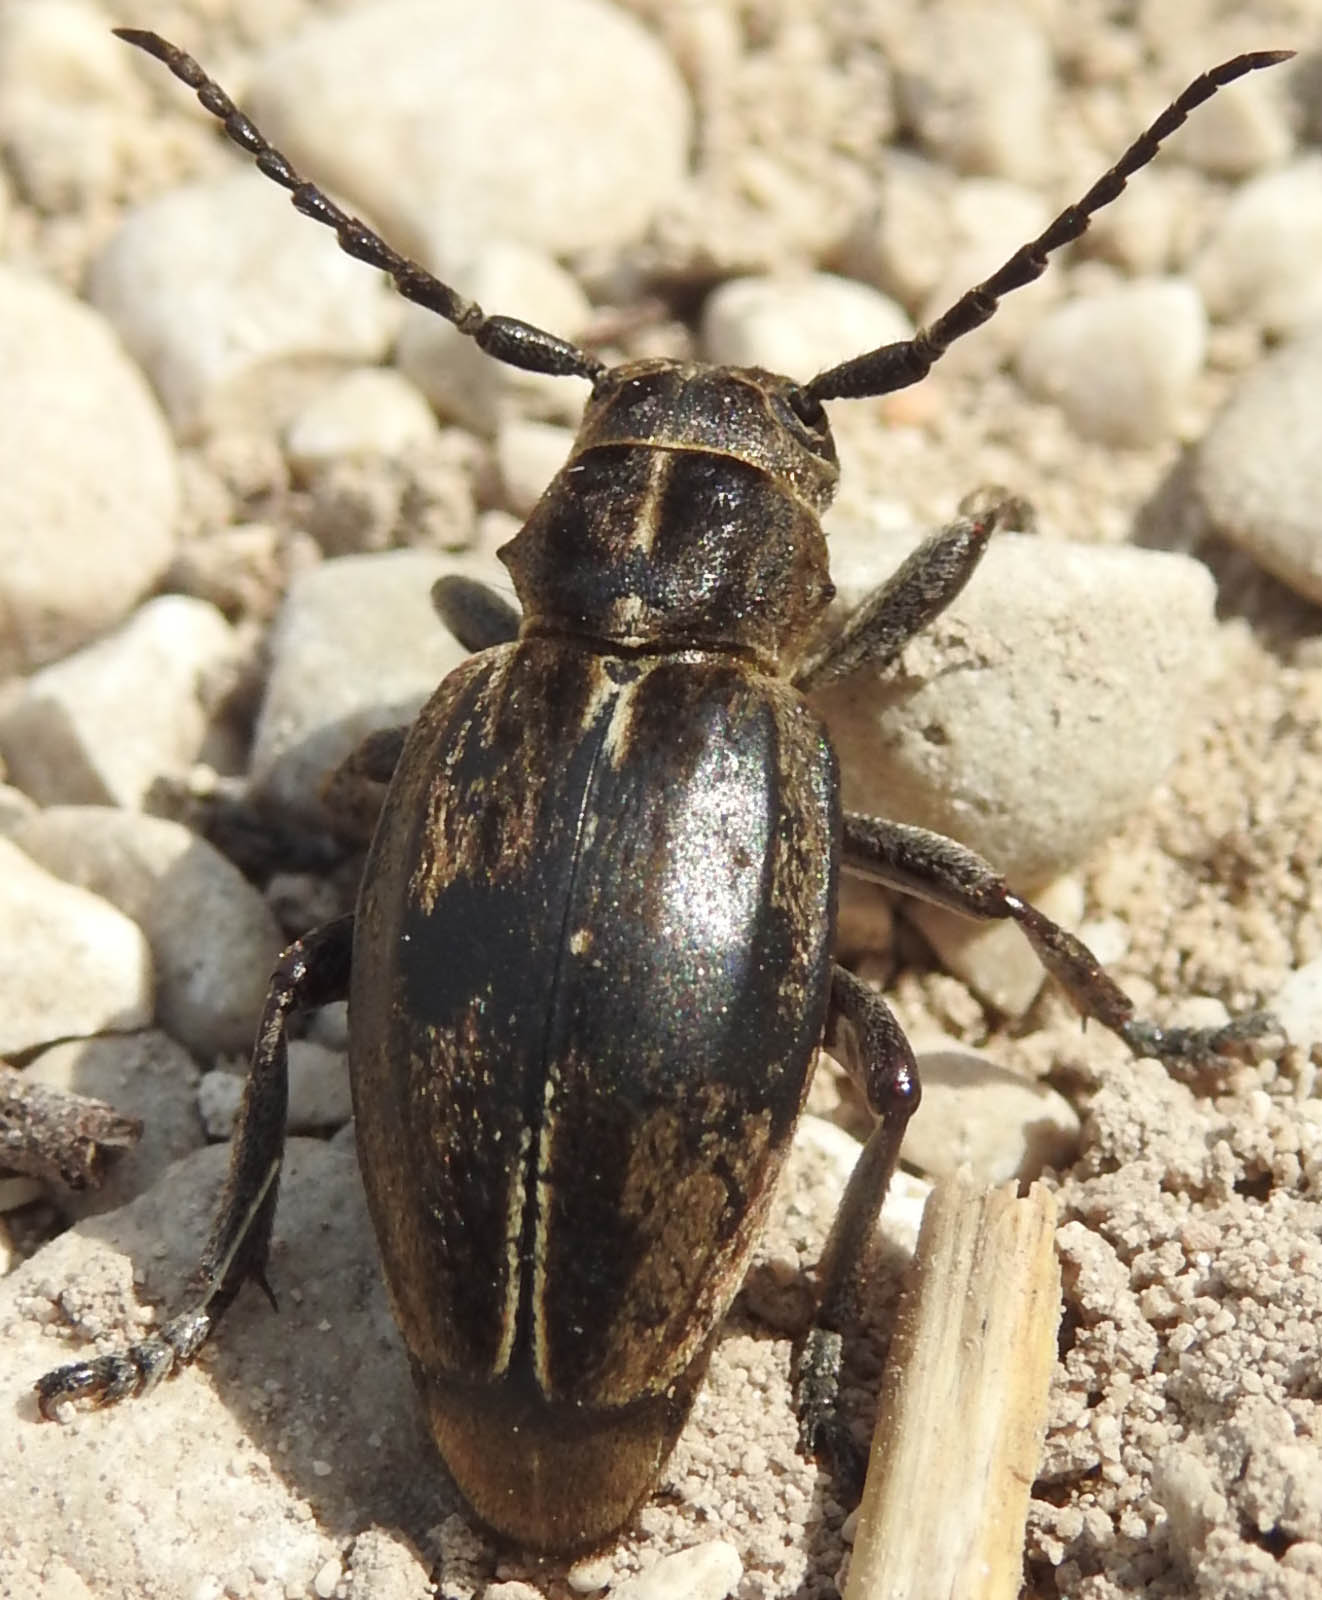 Cerambycidae Lamiinae dalla Basilicata: Dorcadion (Pedestredorcadion) etruscum